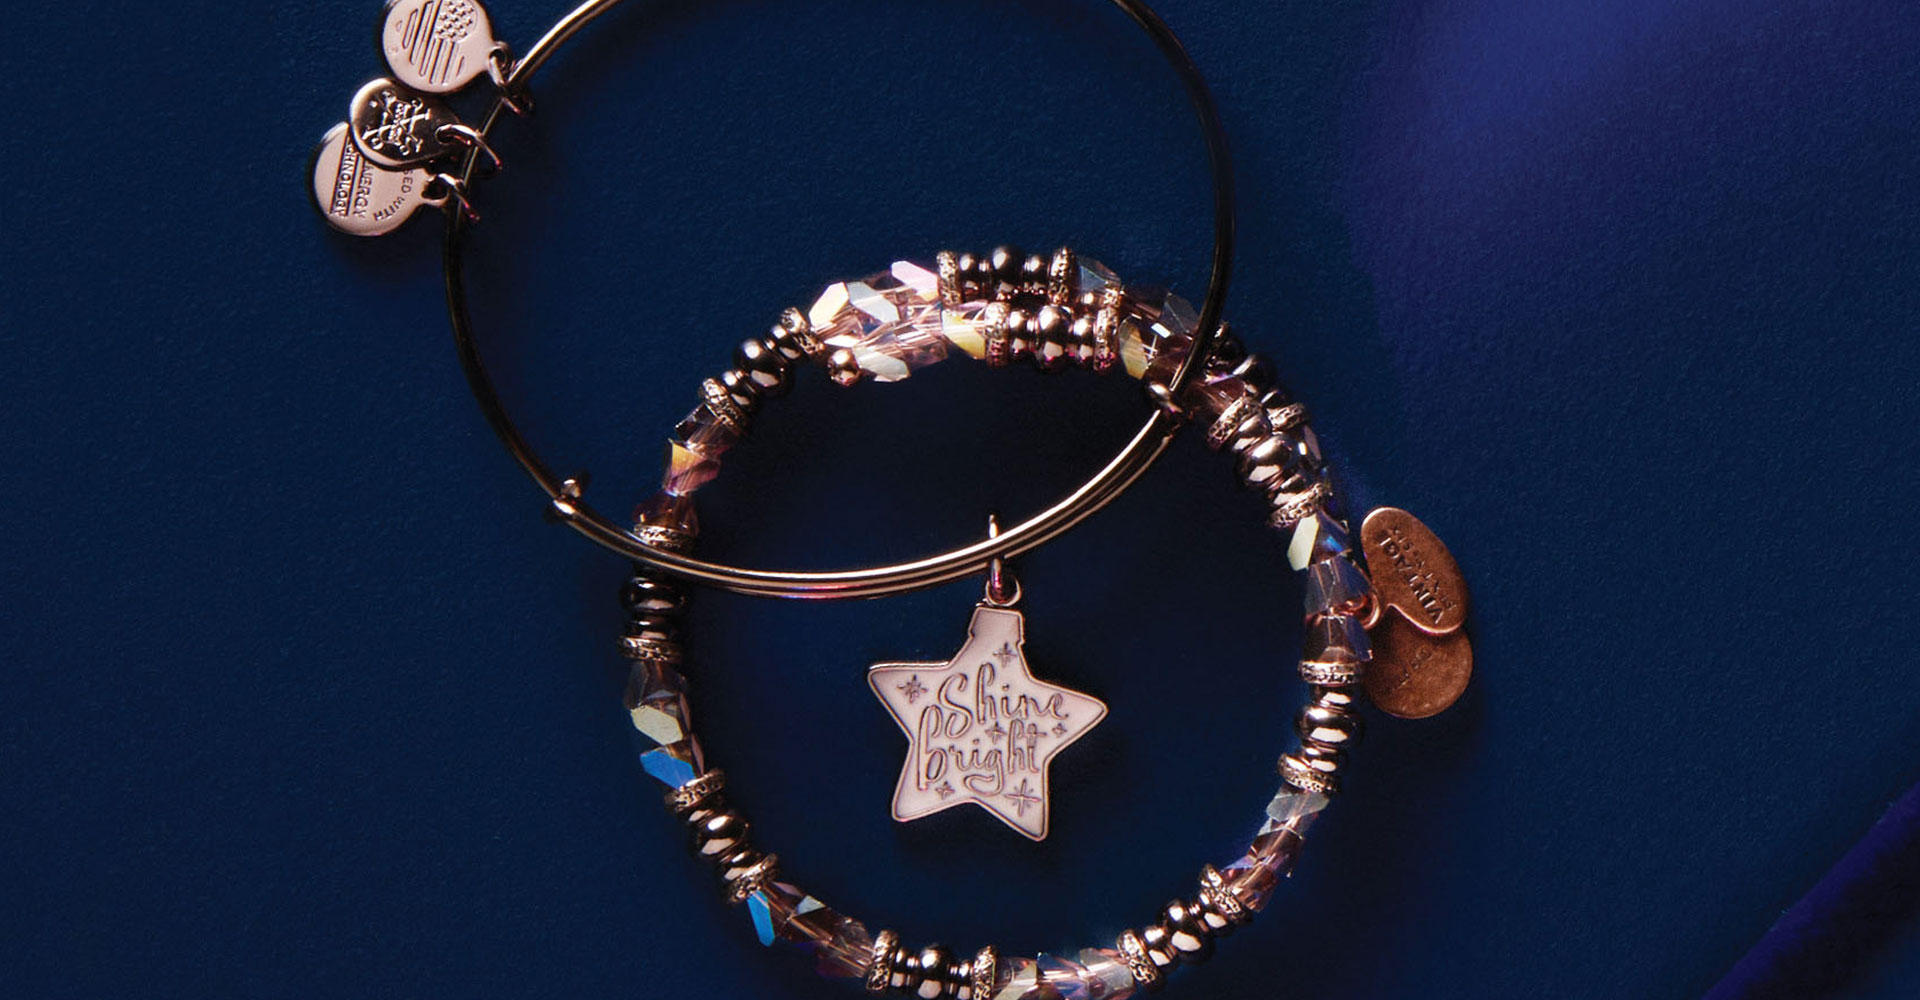 Alex And Ani Bracelets Necklaces Charms Rings Pendants Arnotts